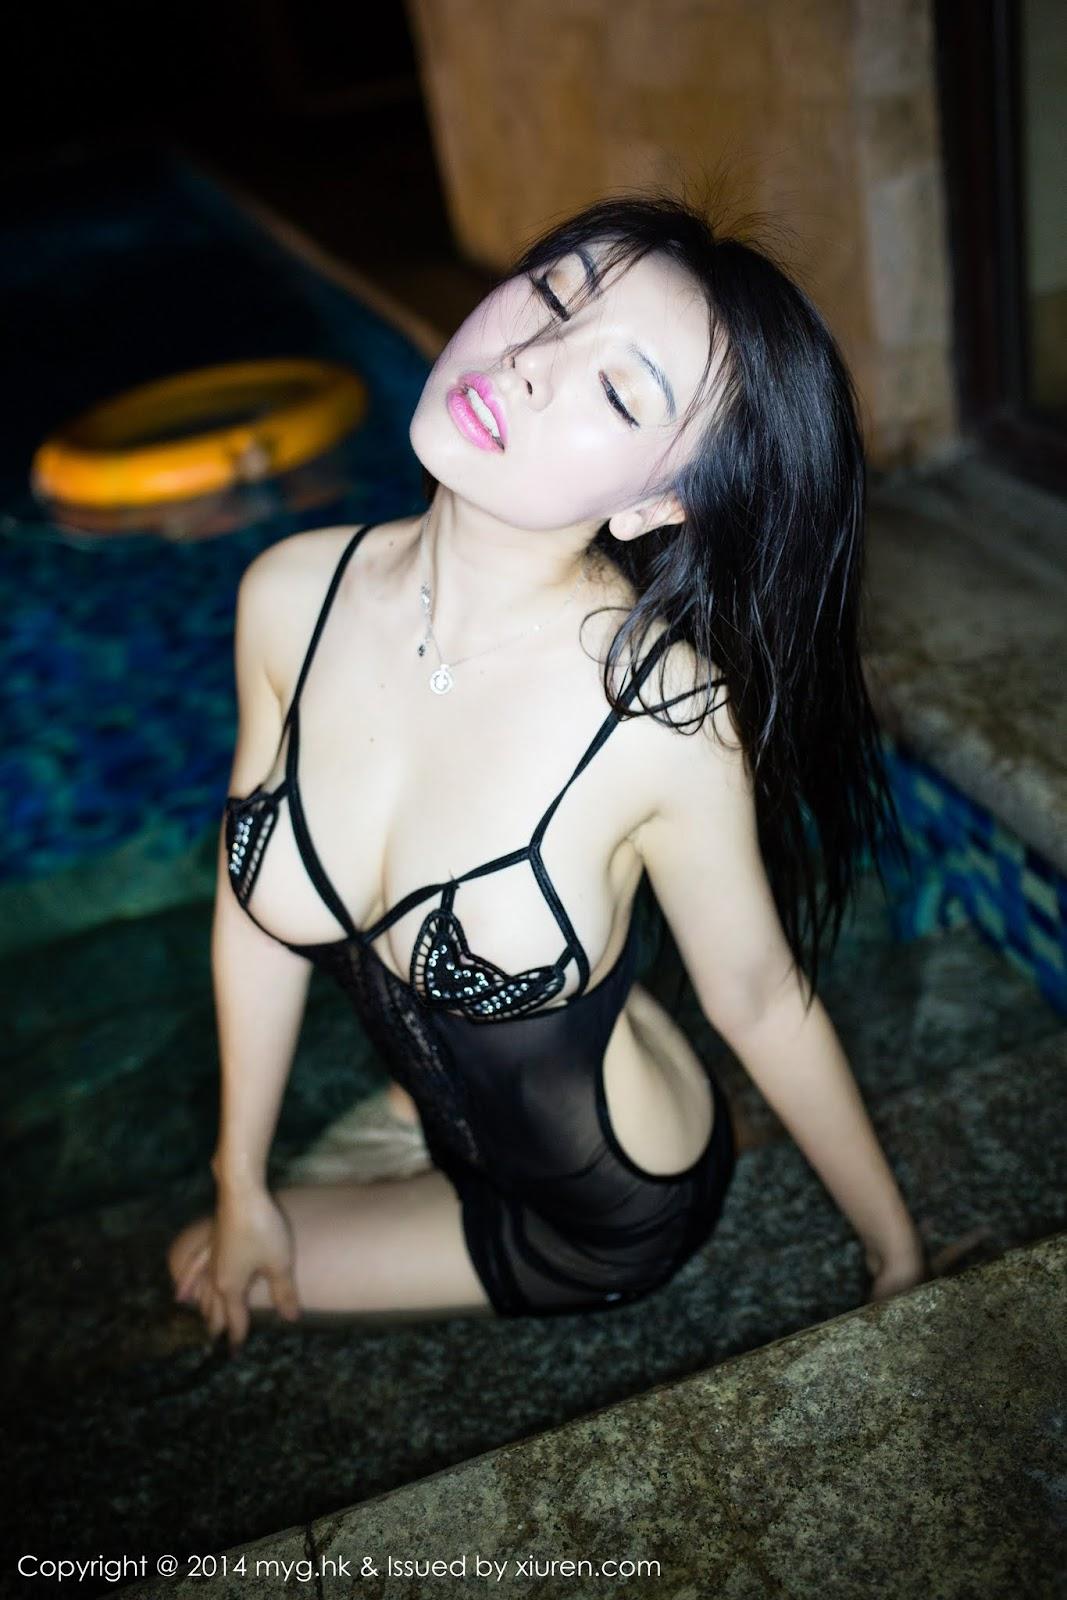 30044 065 - MYGIRL VOL.30 Photo Nude Hot Sexy